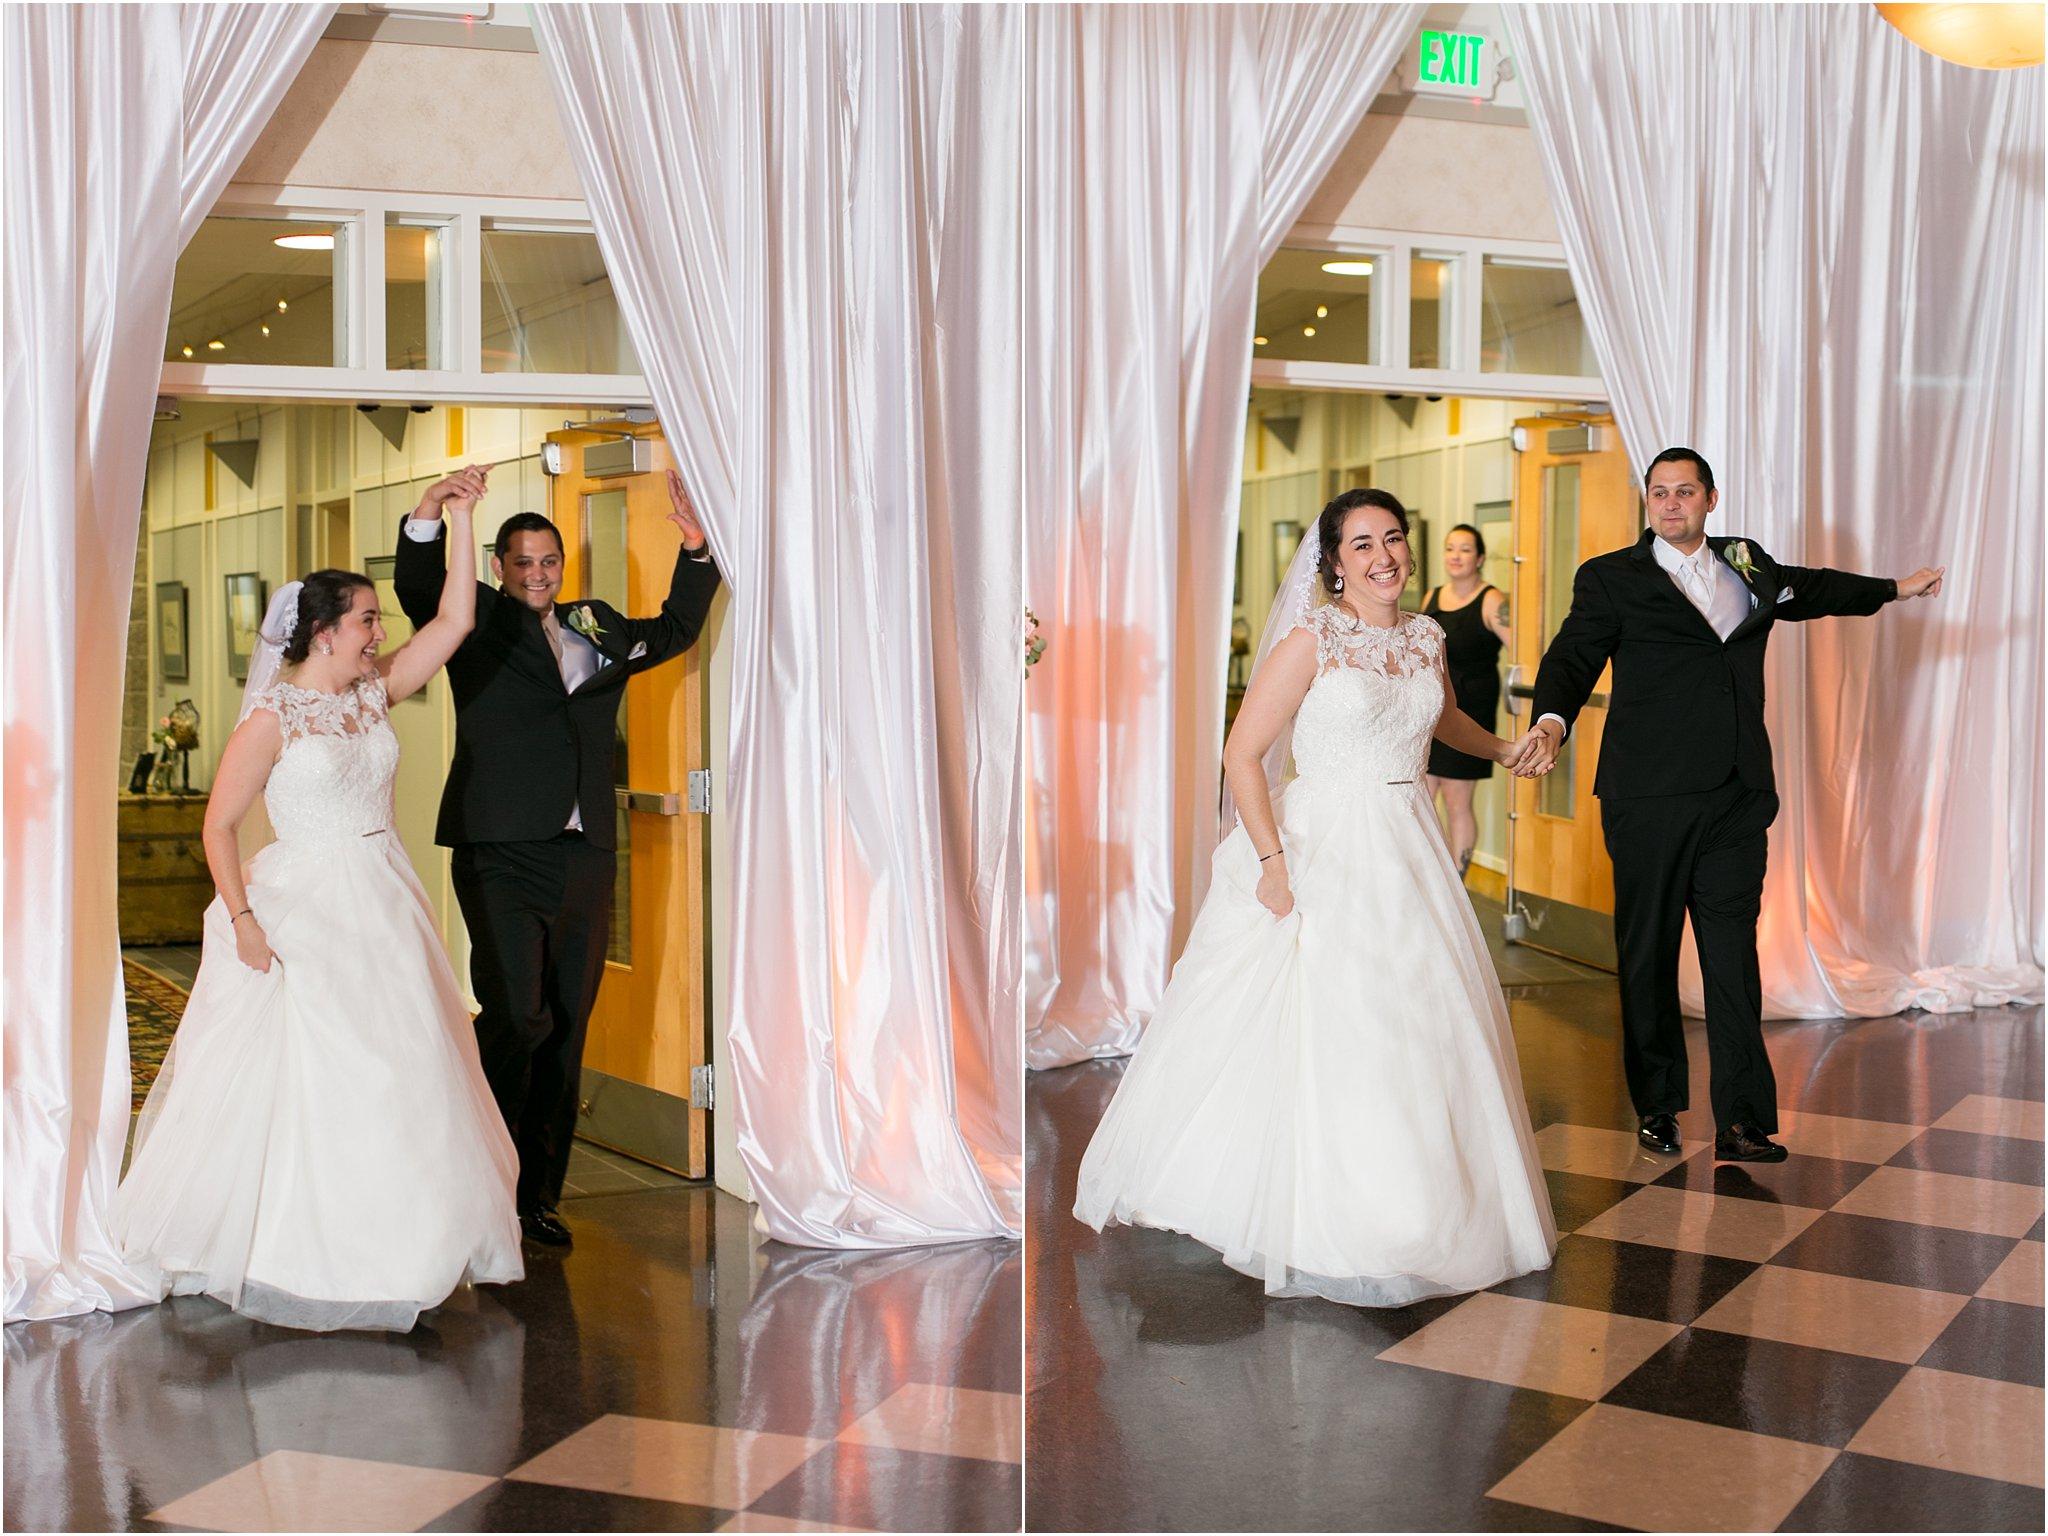 jessica_ryan_photography_virginia_wedding_photographer_wedding_hurricane_norfolk_botanical_gardens_hurricane_matthew_wedding_3626